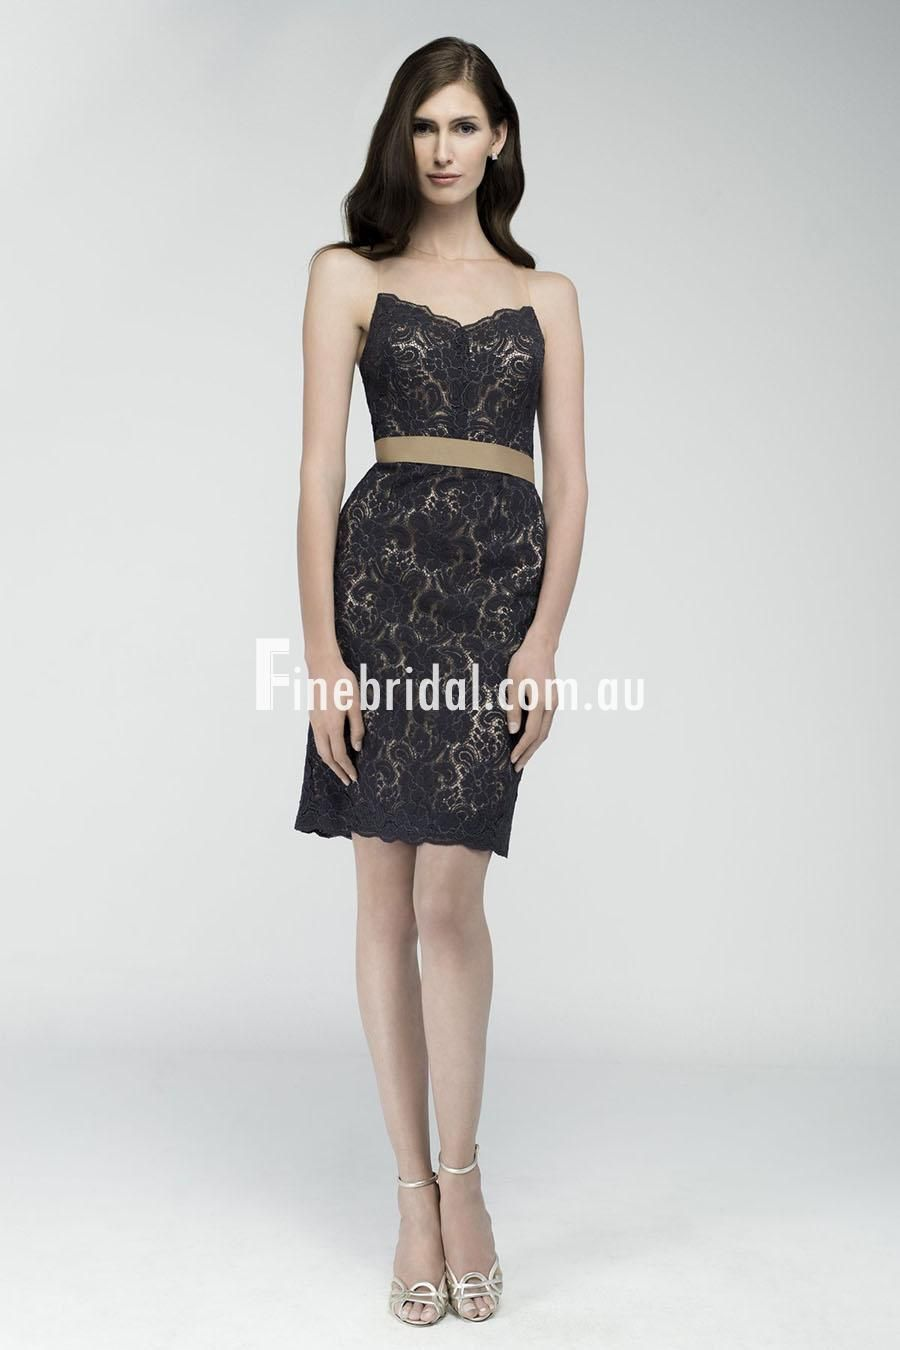 Illusion charcoal sleeveless sheath short bridesmaid dress